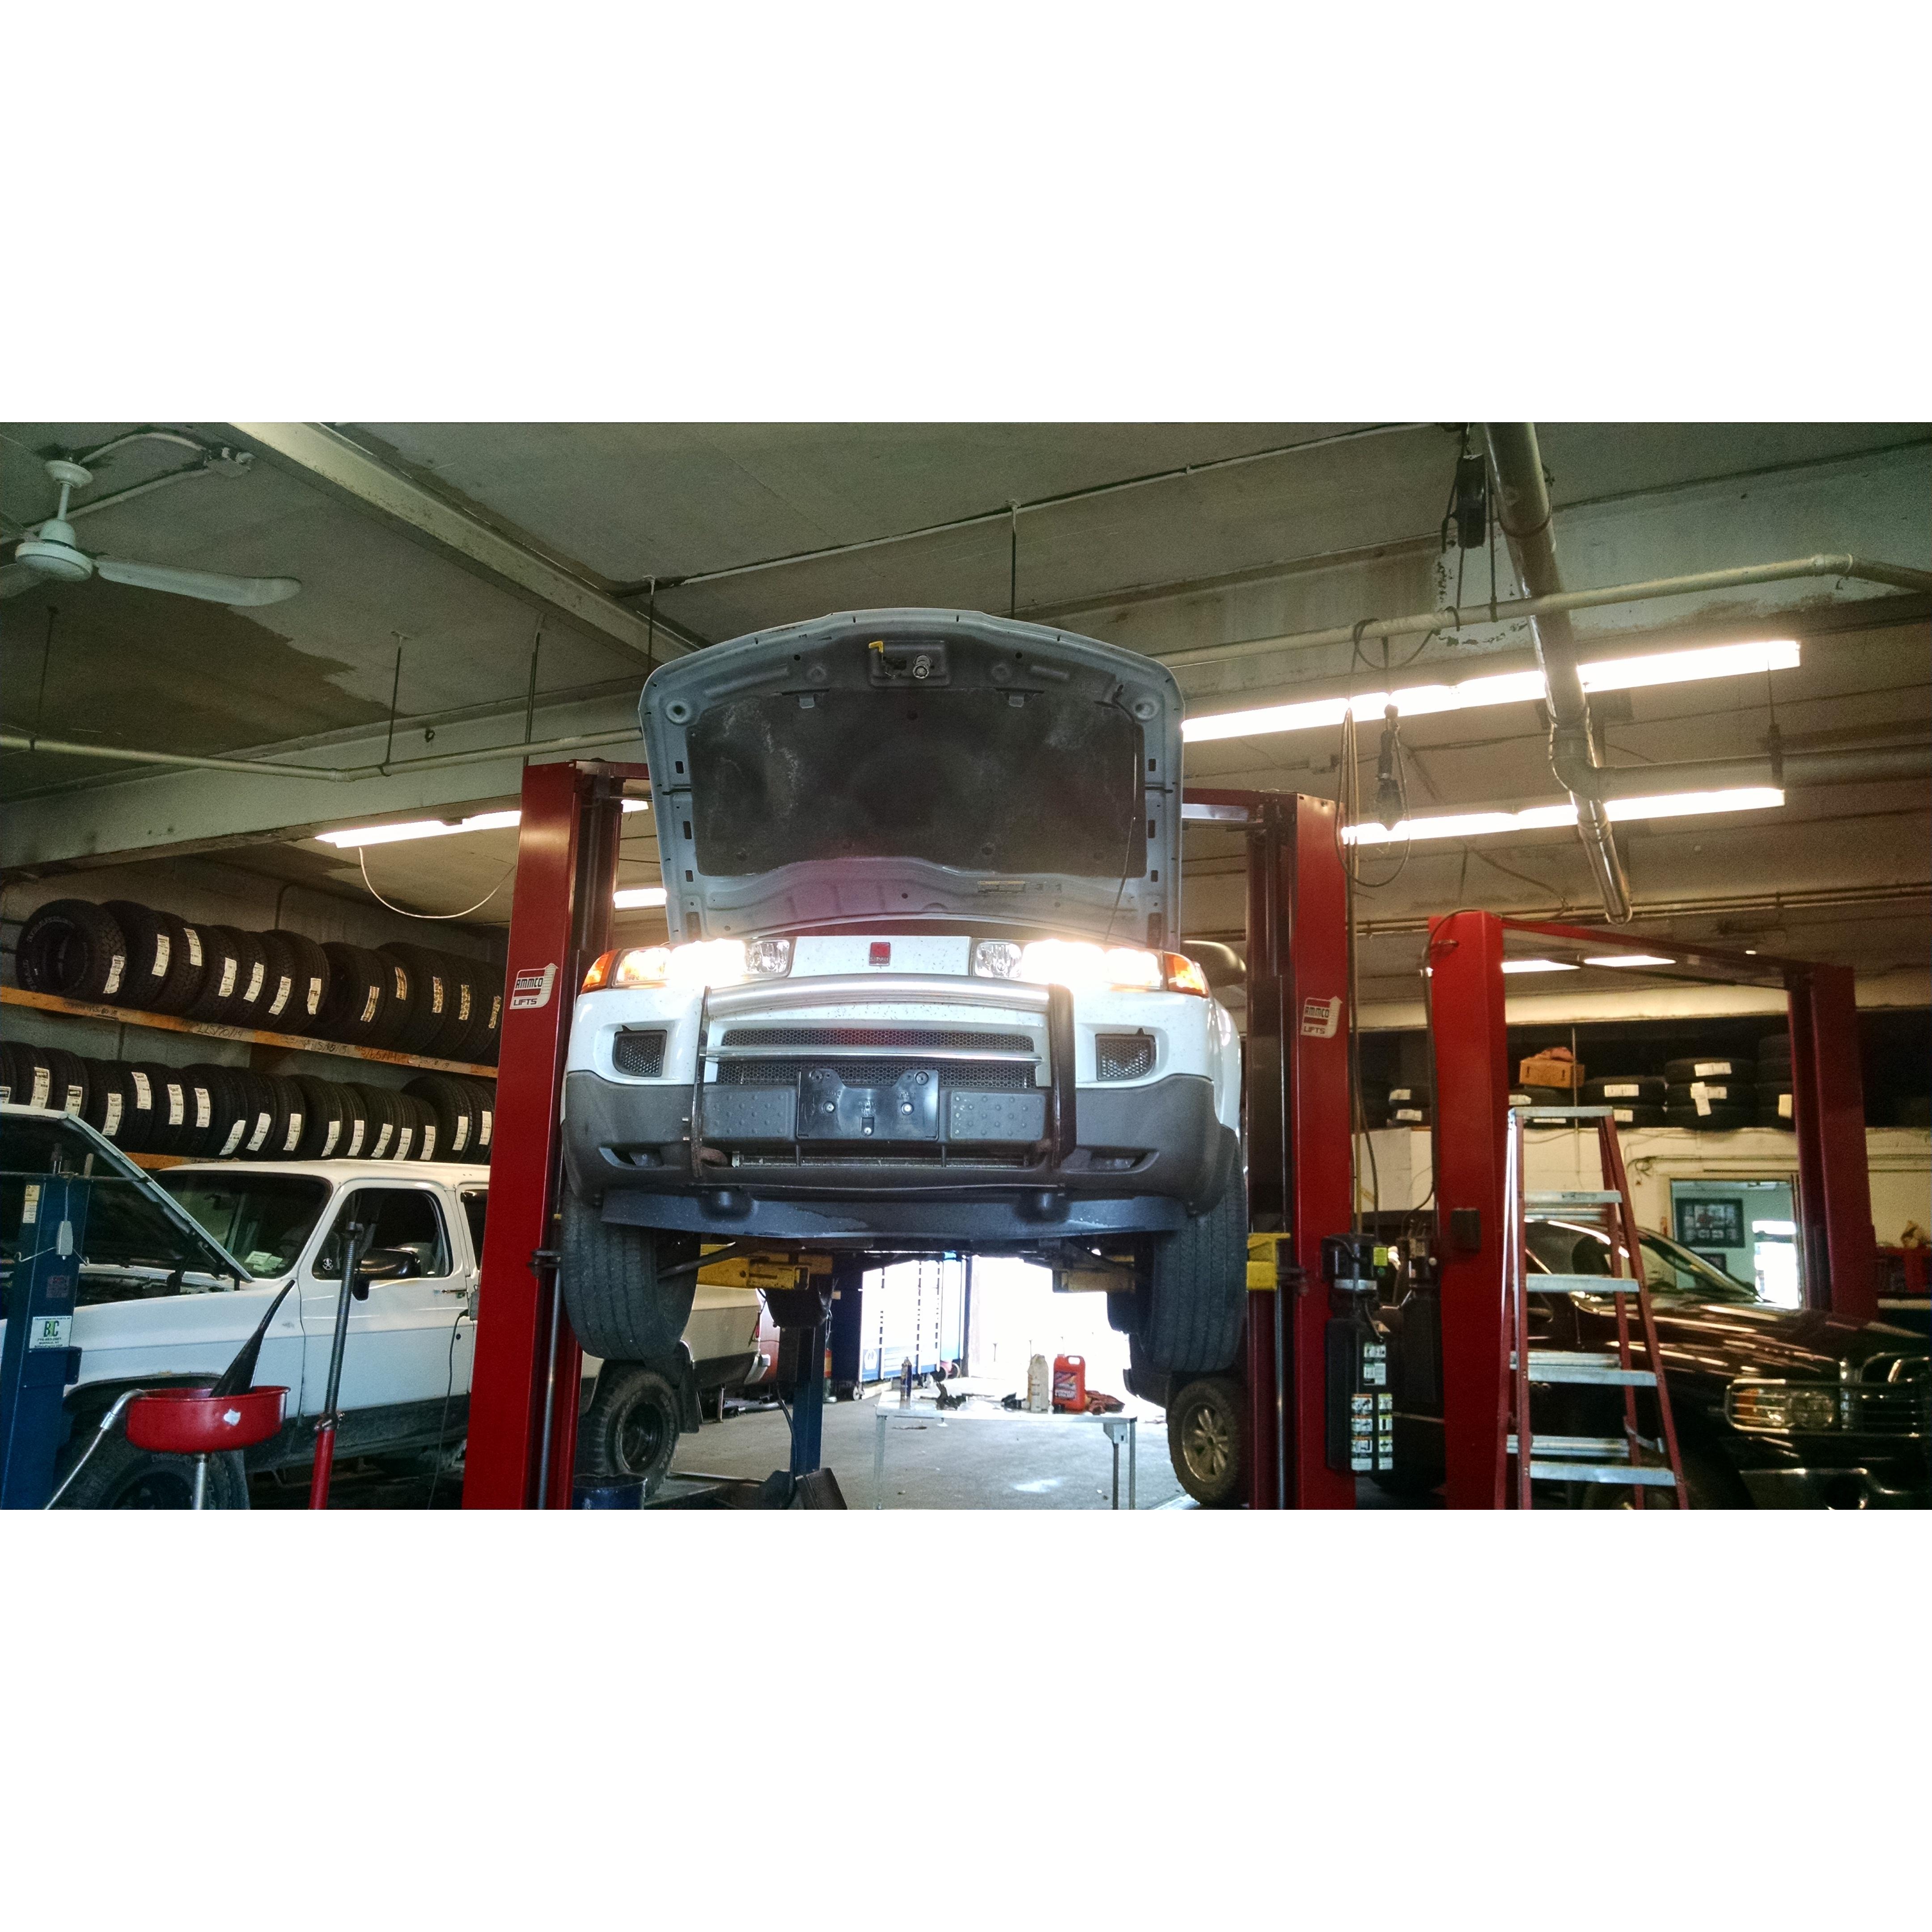 Goodguys Automotive